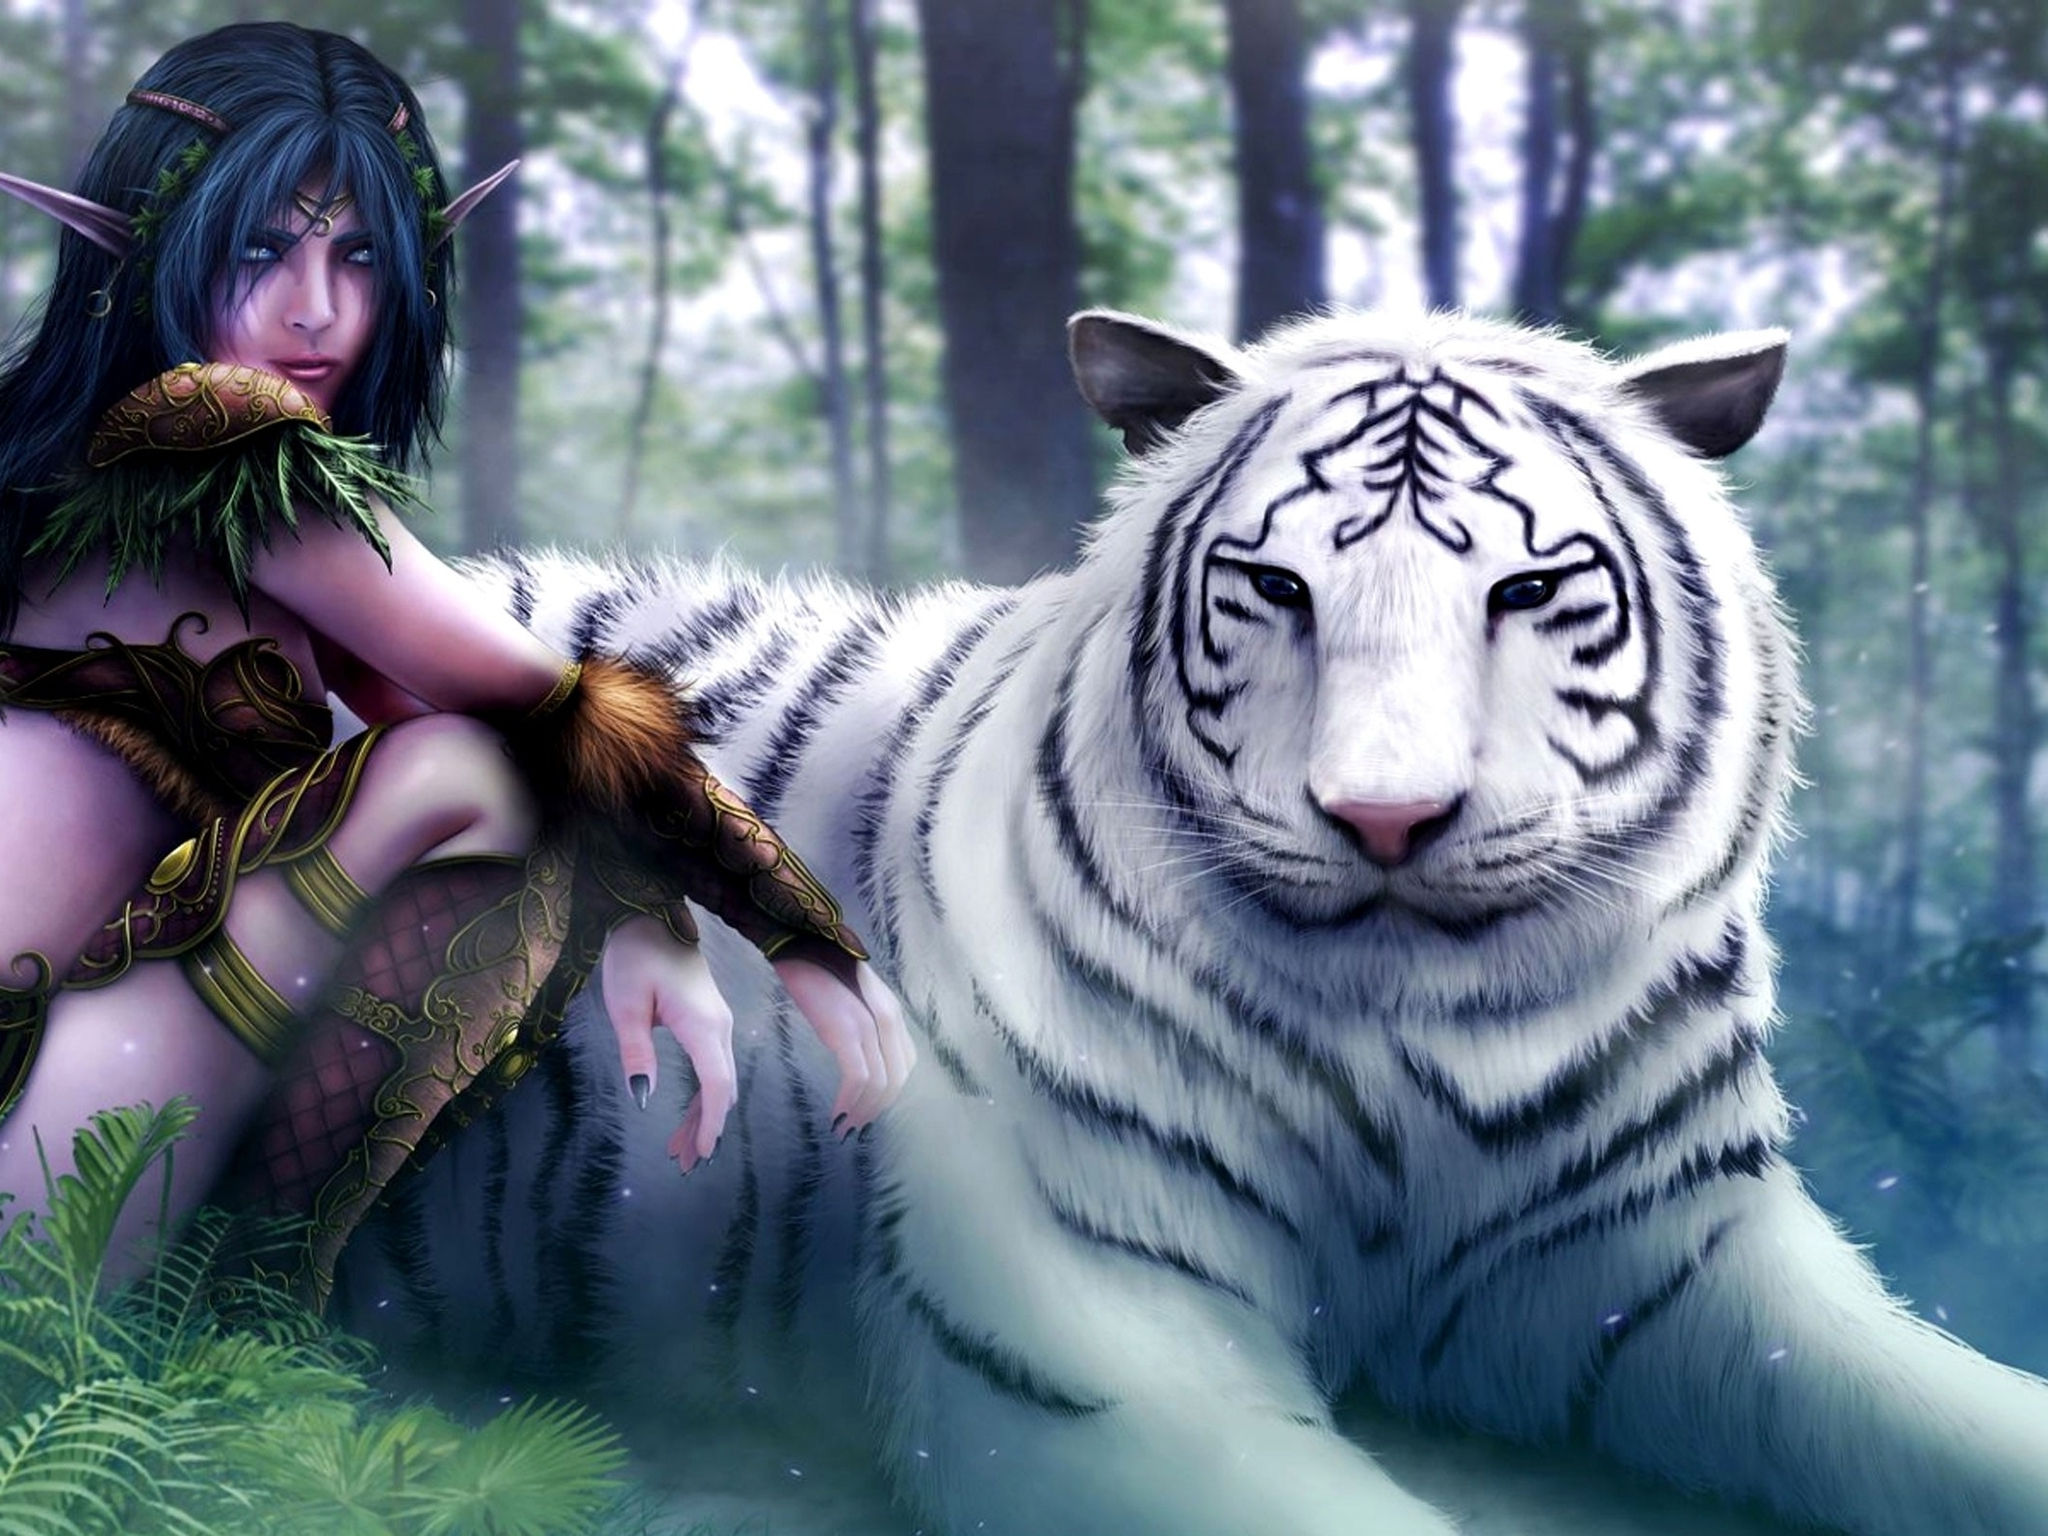 World of warcraft white tiger fantasy art elves artwork drawings (2048x1536)